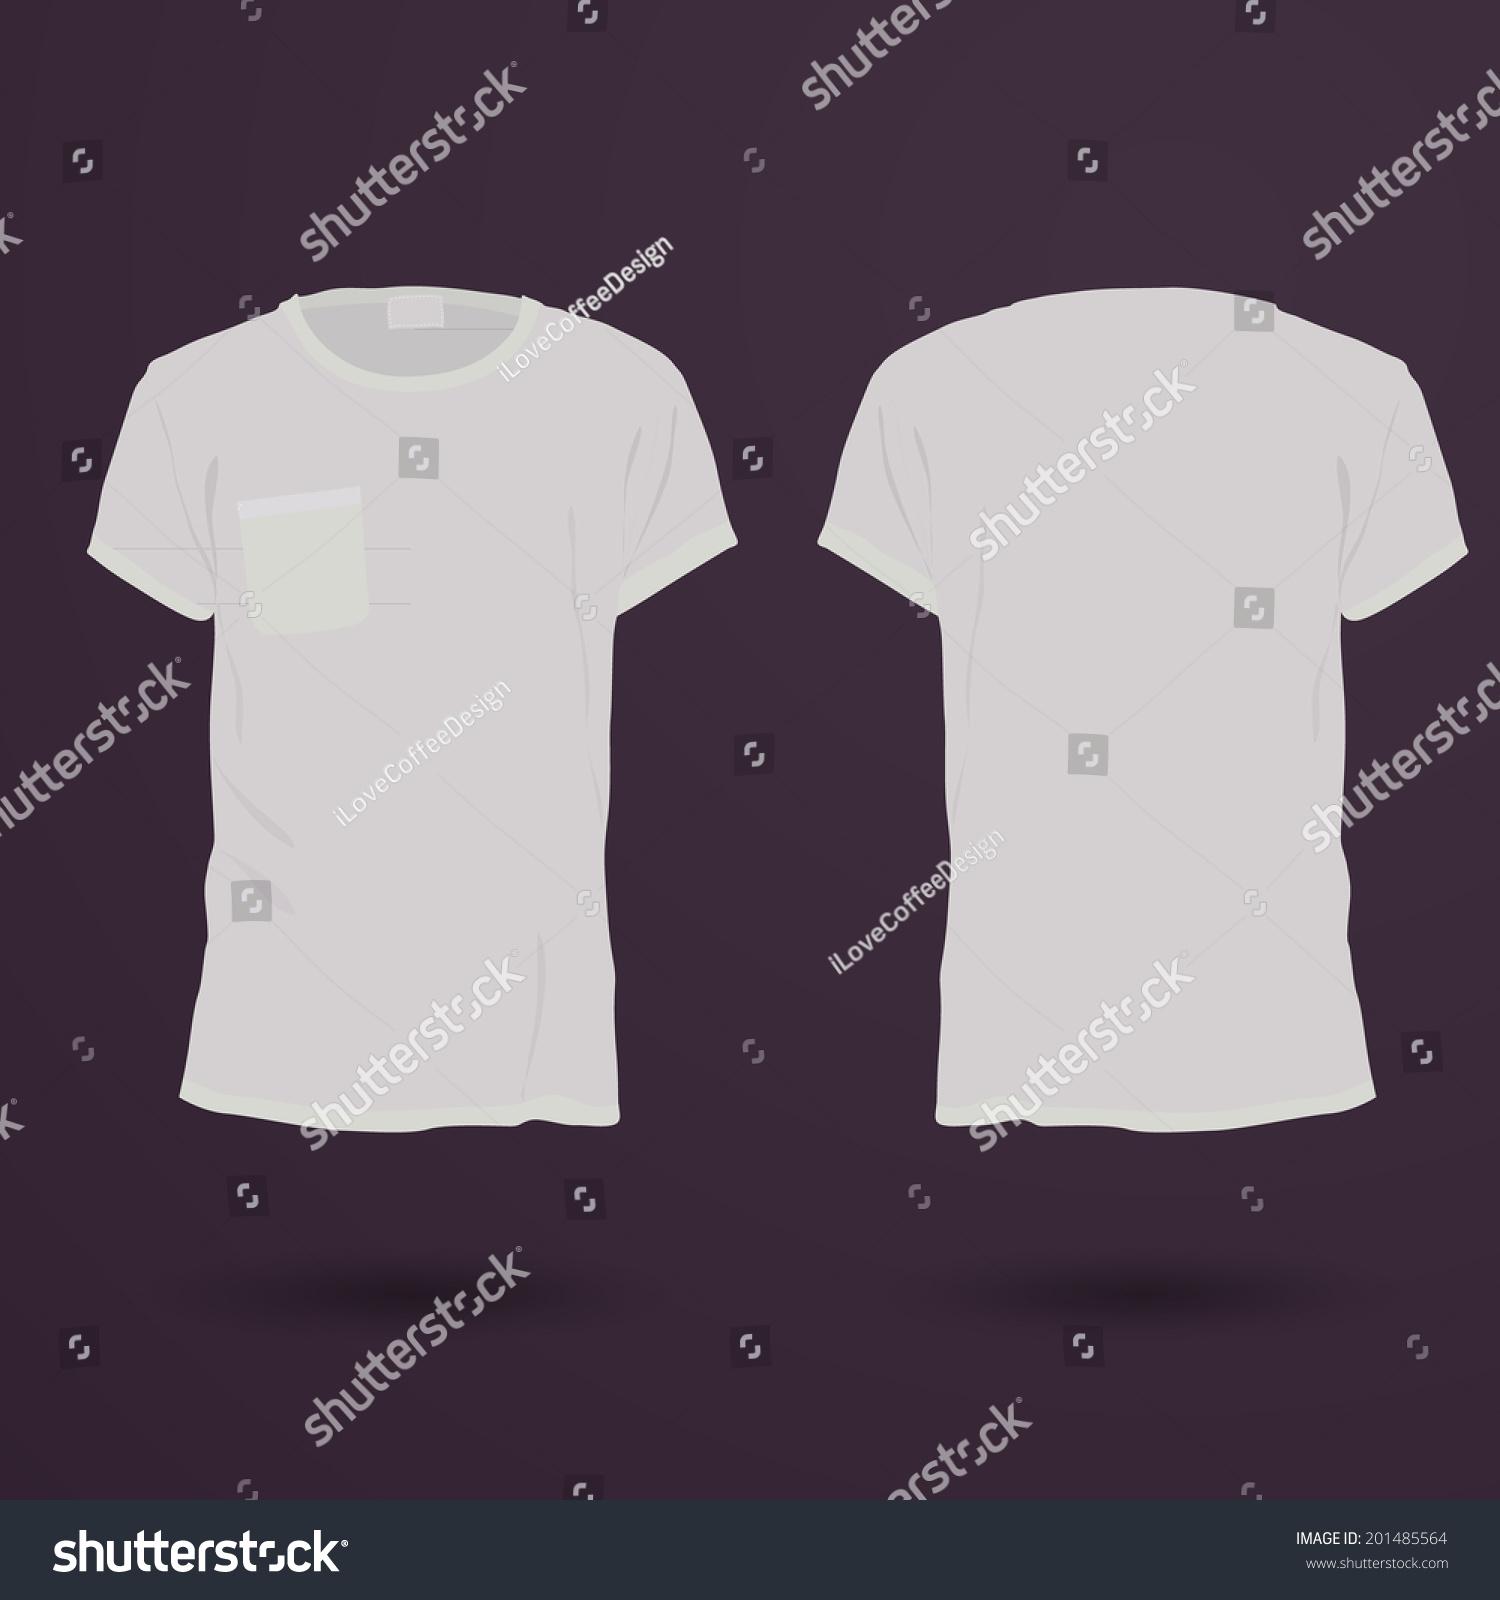 Blank Tshirt Template Front Back Stock Vector 201485564 - Shutterstock